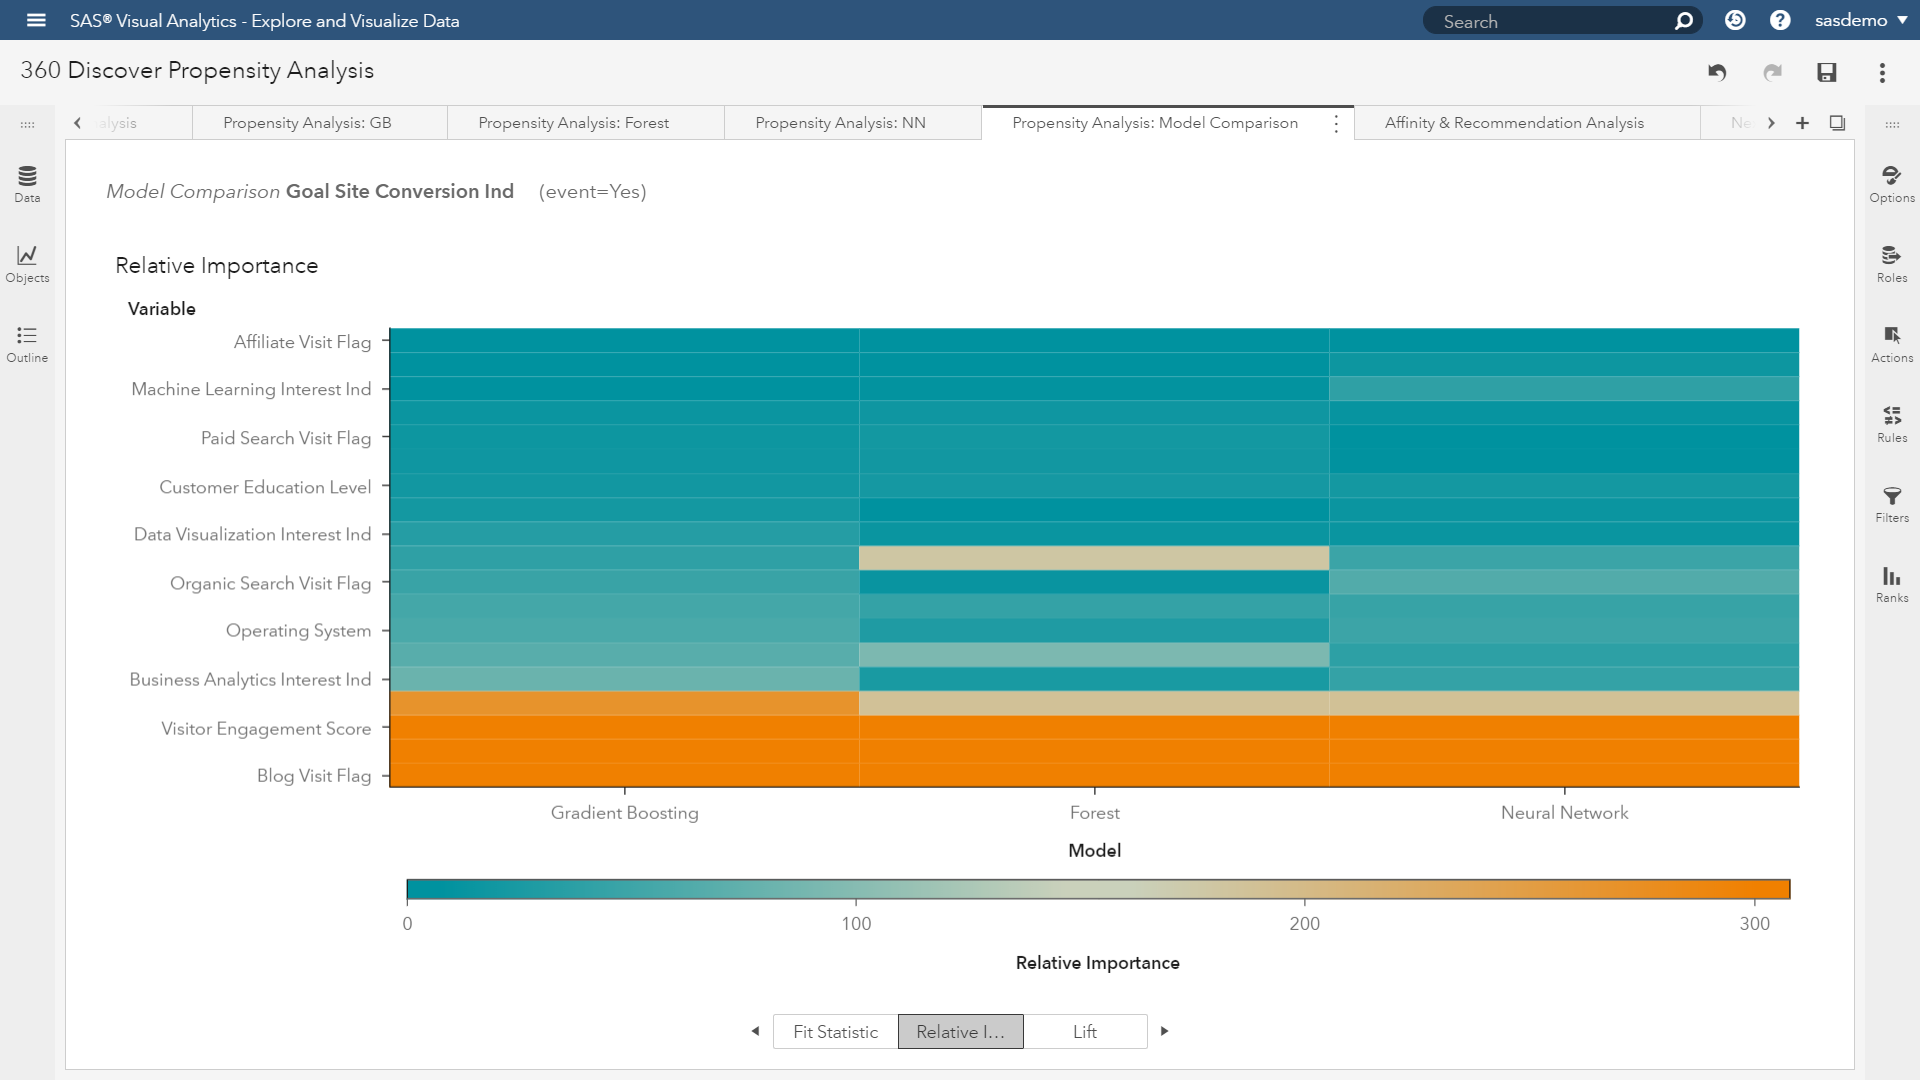 SAS Customer Intelligence 360: Goals, propensity models, and machine